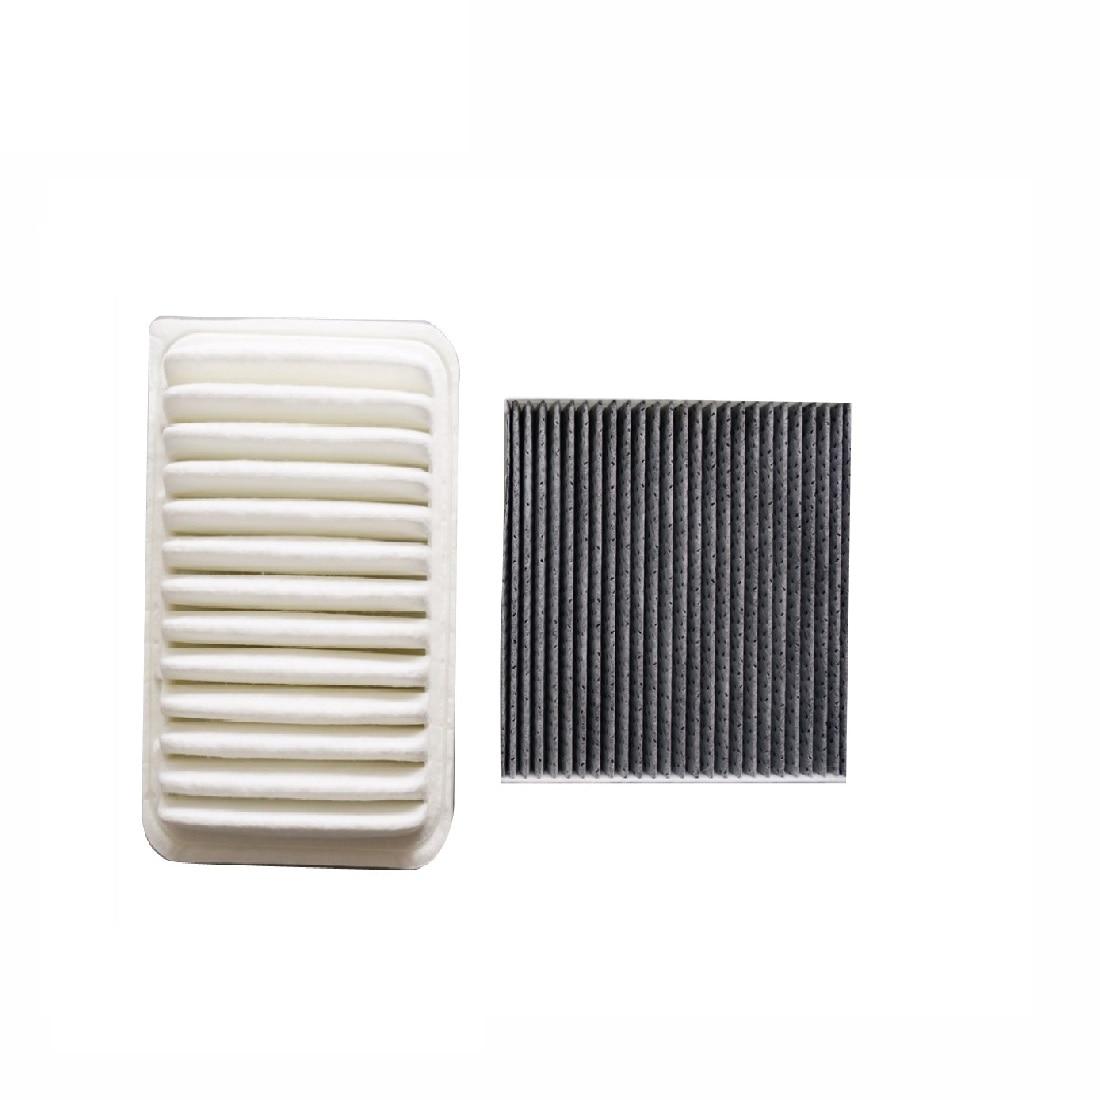 Filtro de cabine de filtro de ar 2 pces para toyota highlande 2.7 3.5 modelo 2009-2015 carro accessoris filtro 17801-20040